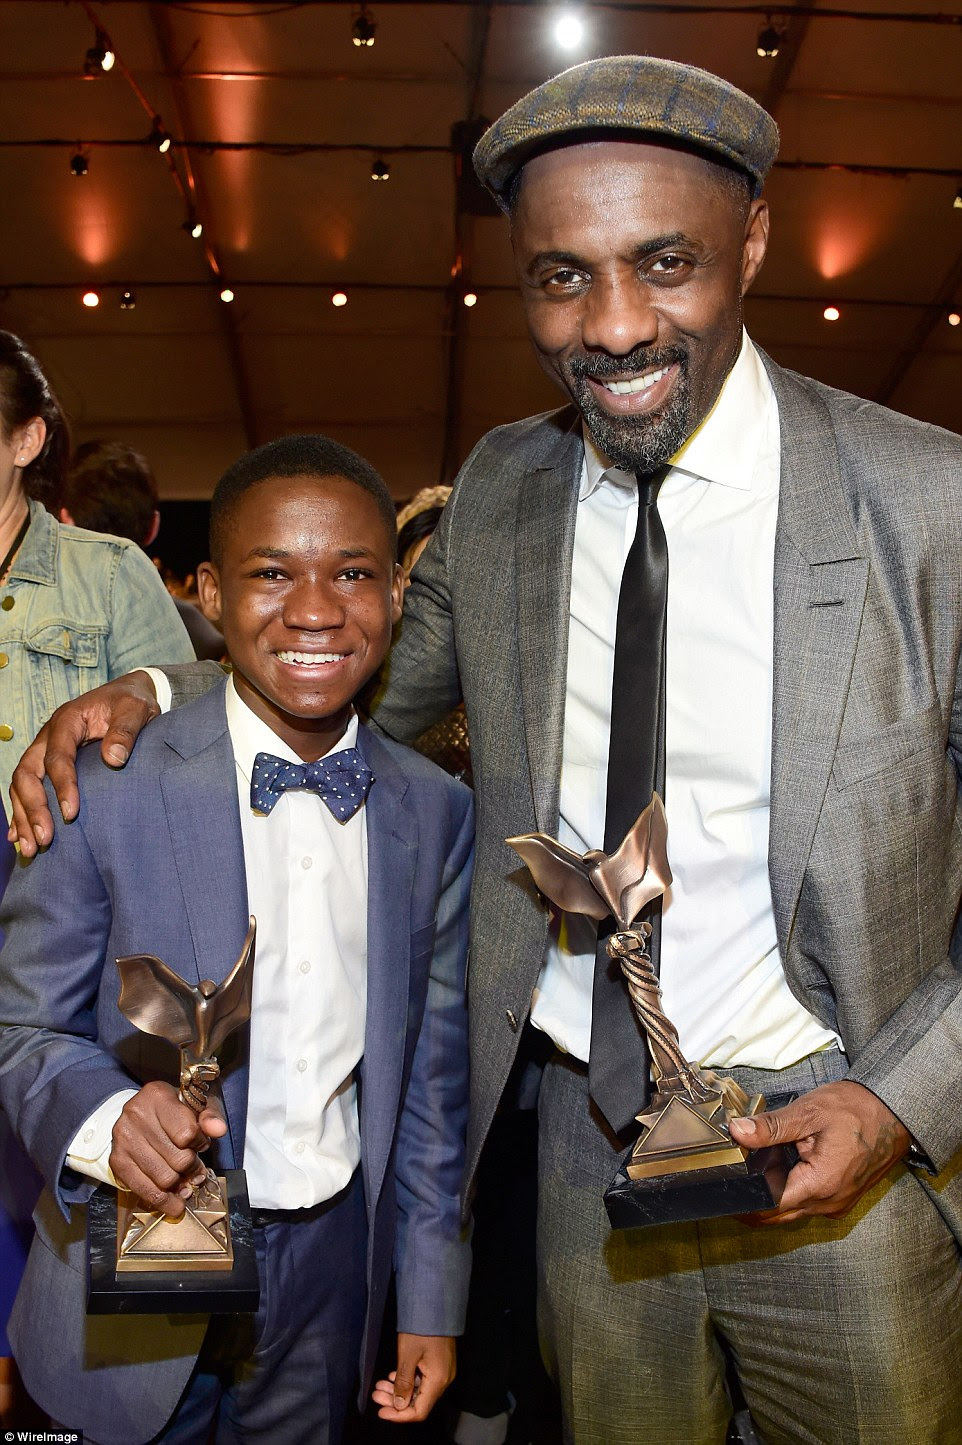 Winning pair:Abraham Attah, winner of the Best Male Lead award for Beasts of No Nation posed alongside fellow winner Idris Elba